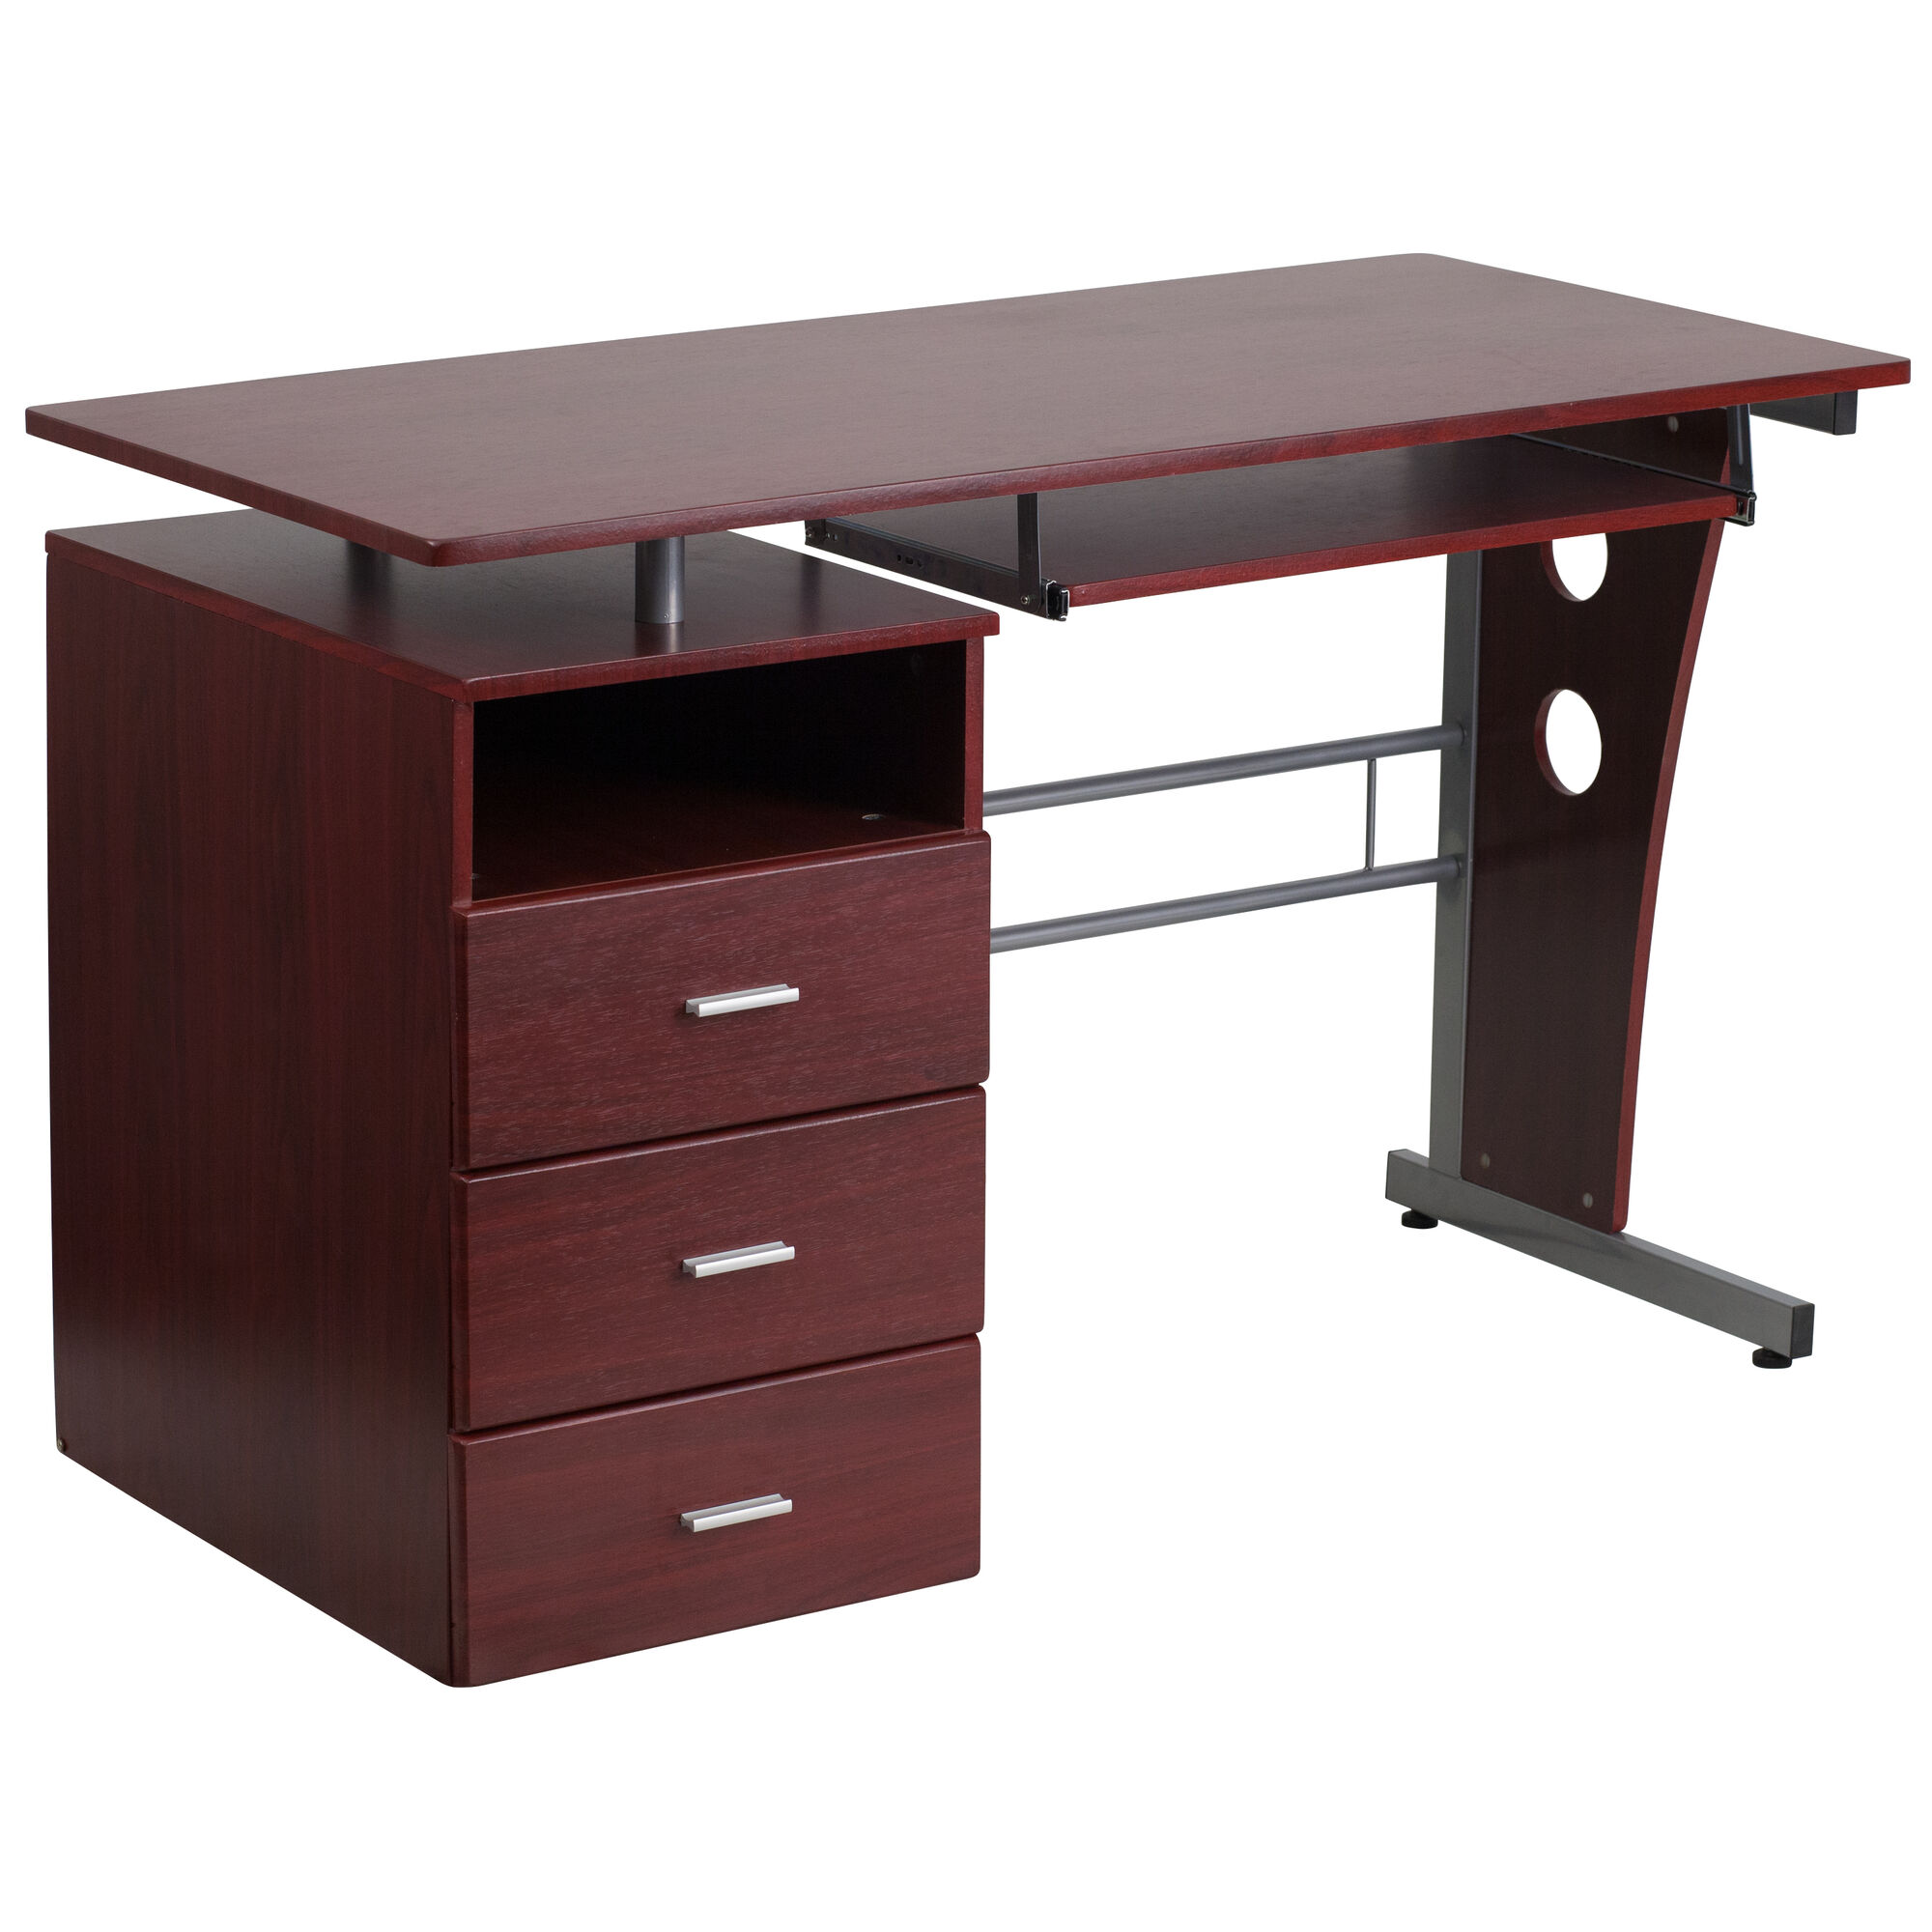 Flash Furniture Nan Wk 008 Gg